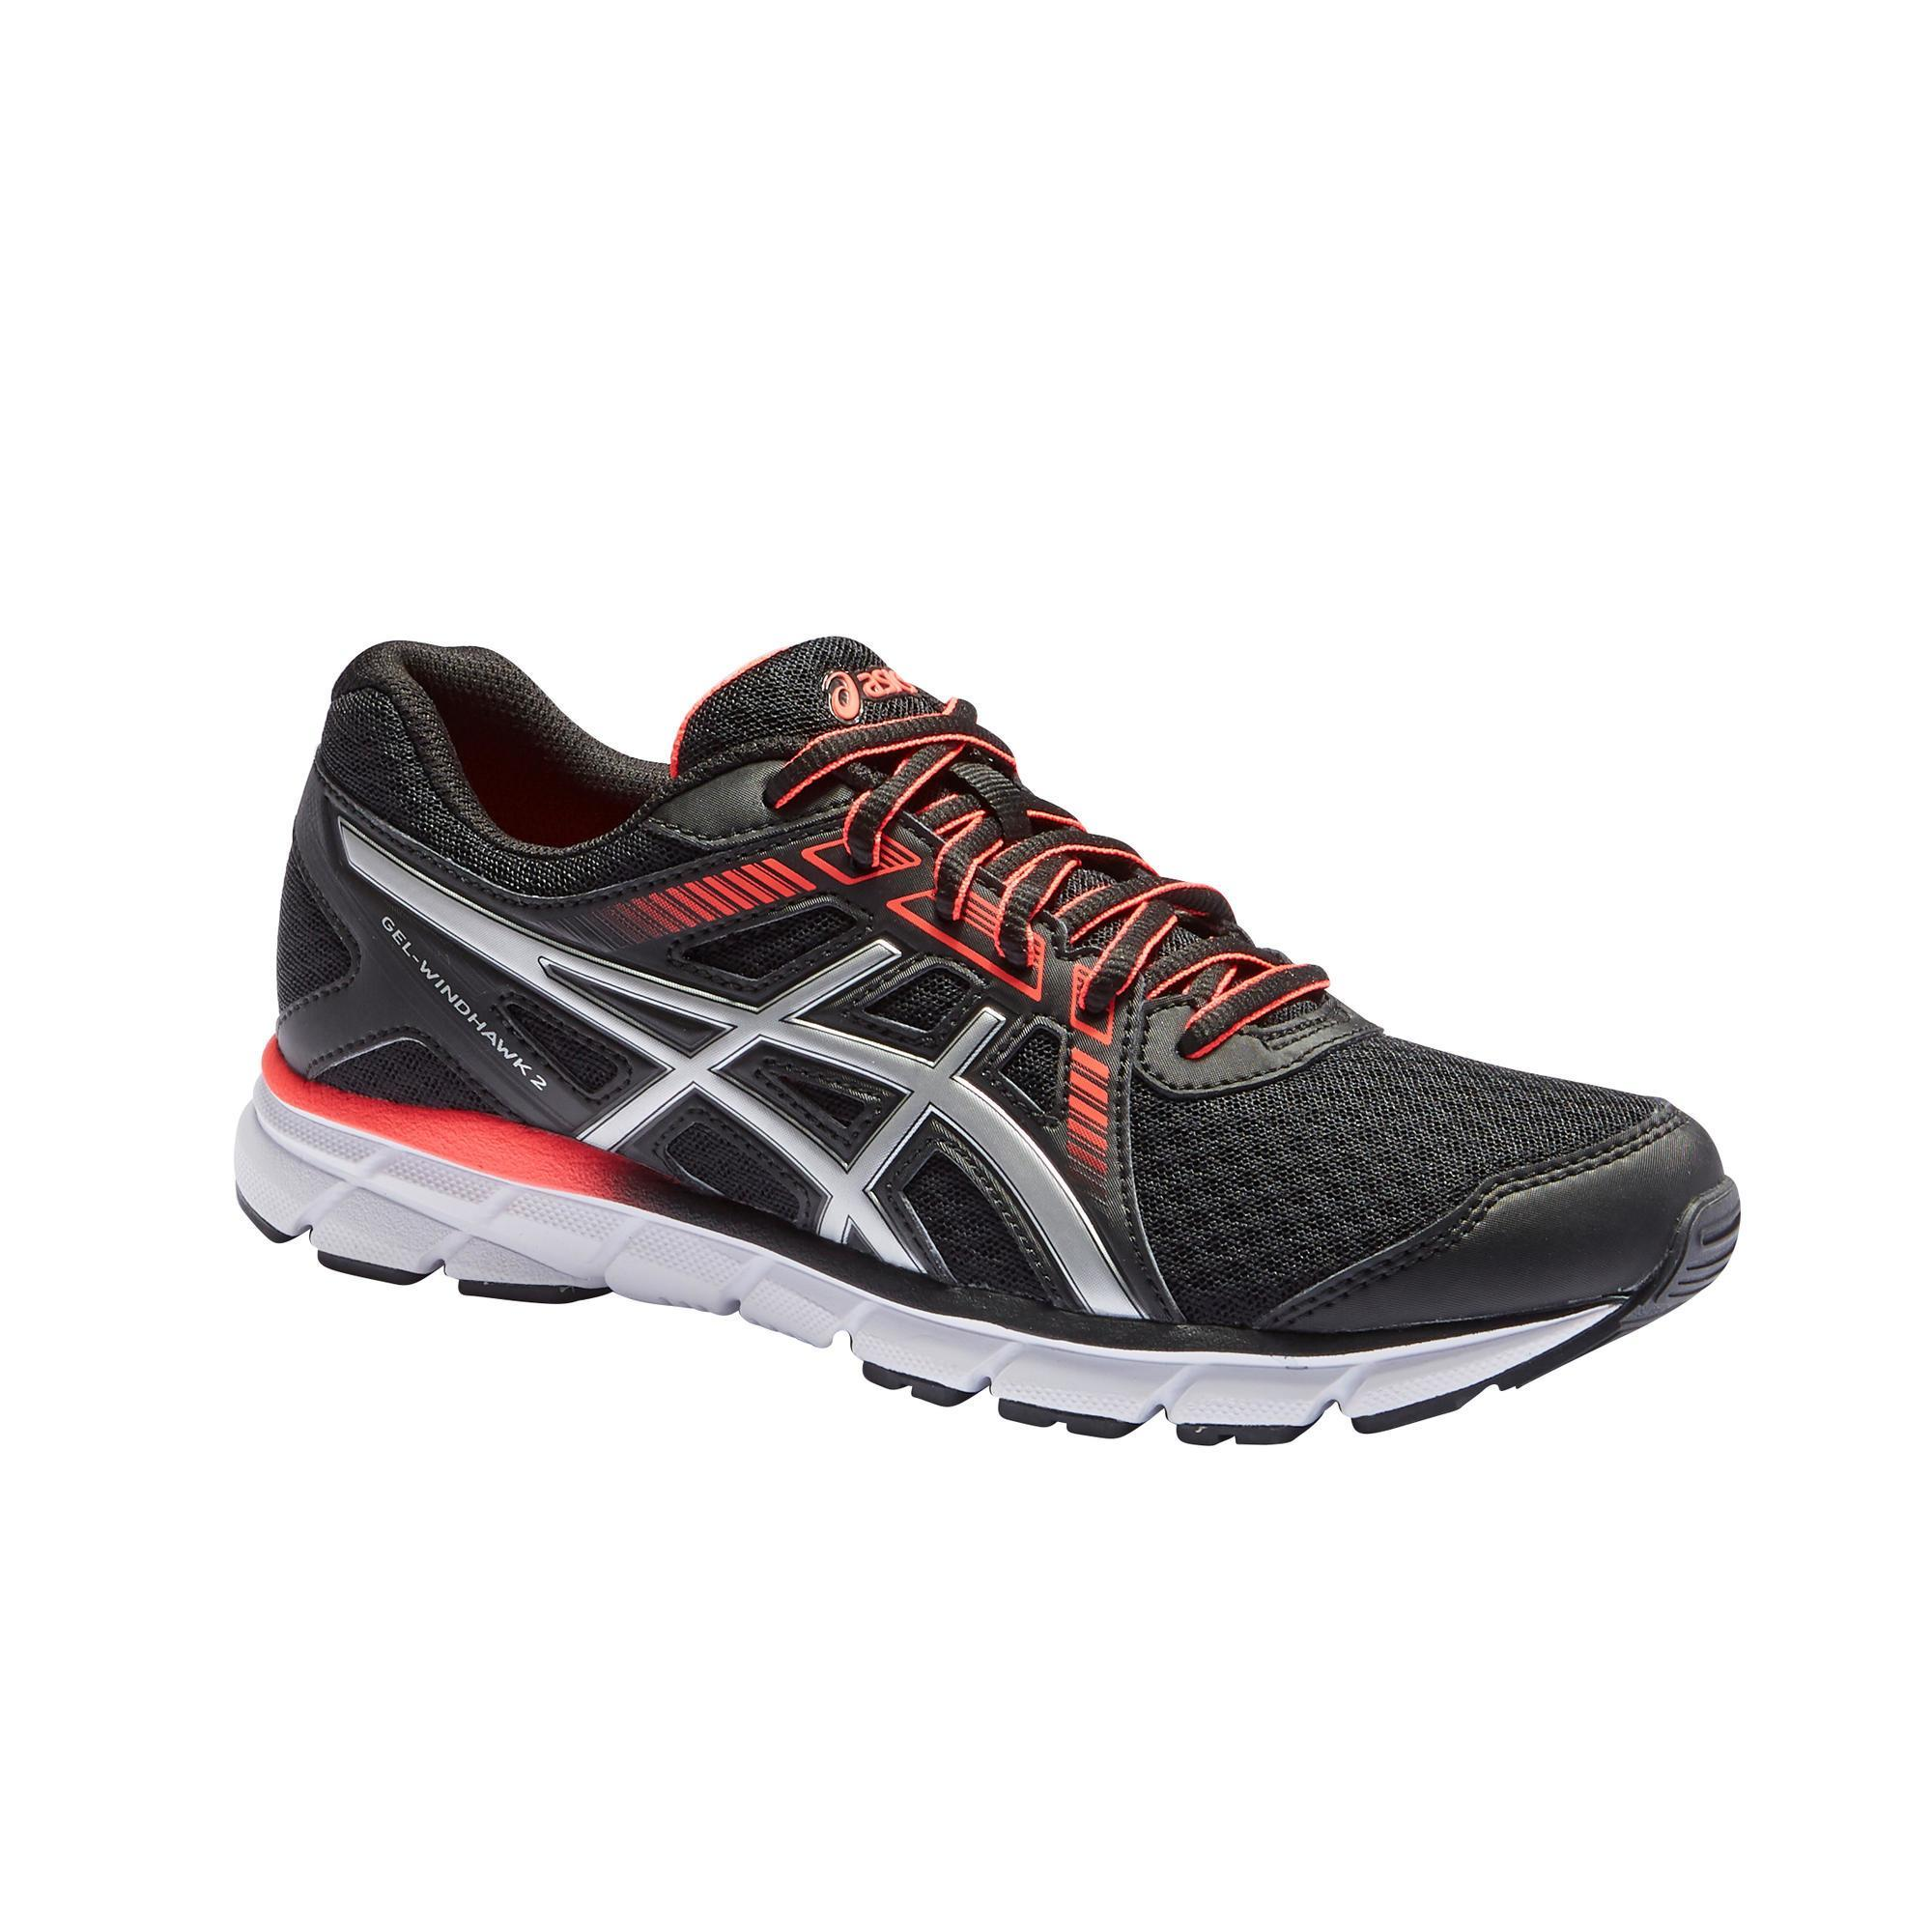 4ca3b8311f8 Comprar zapatillas de running online